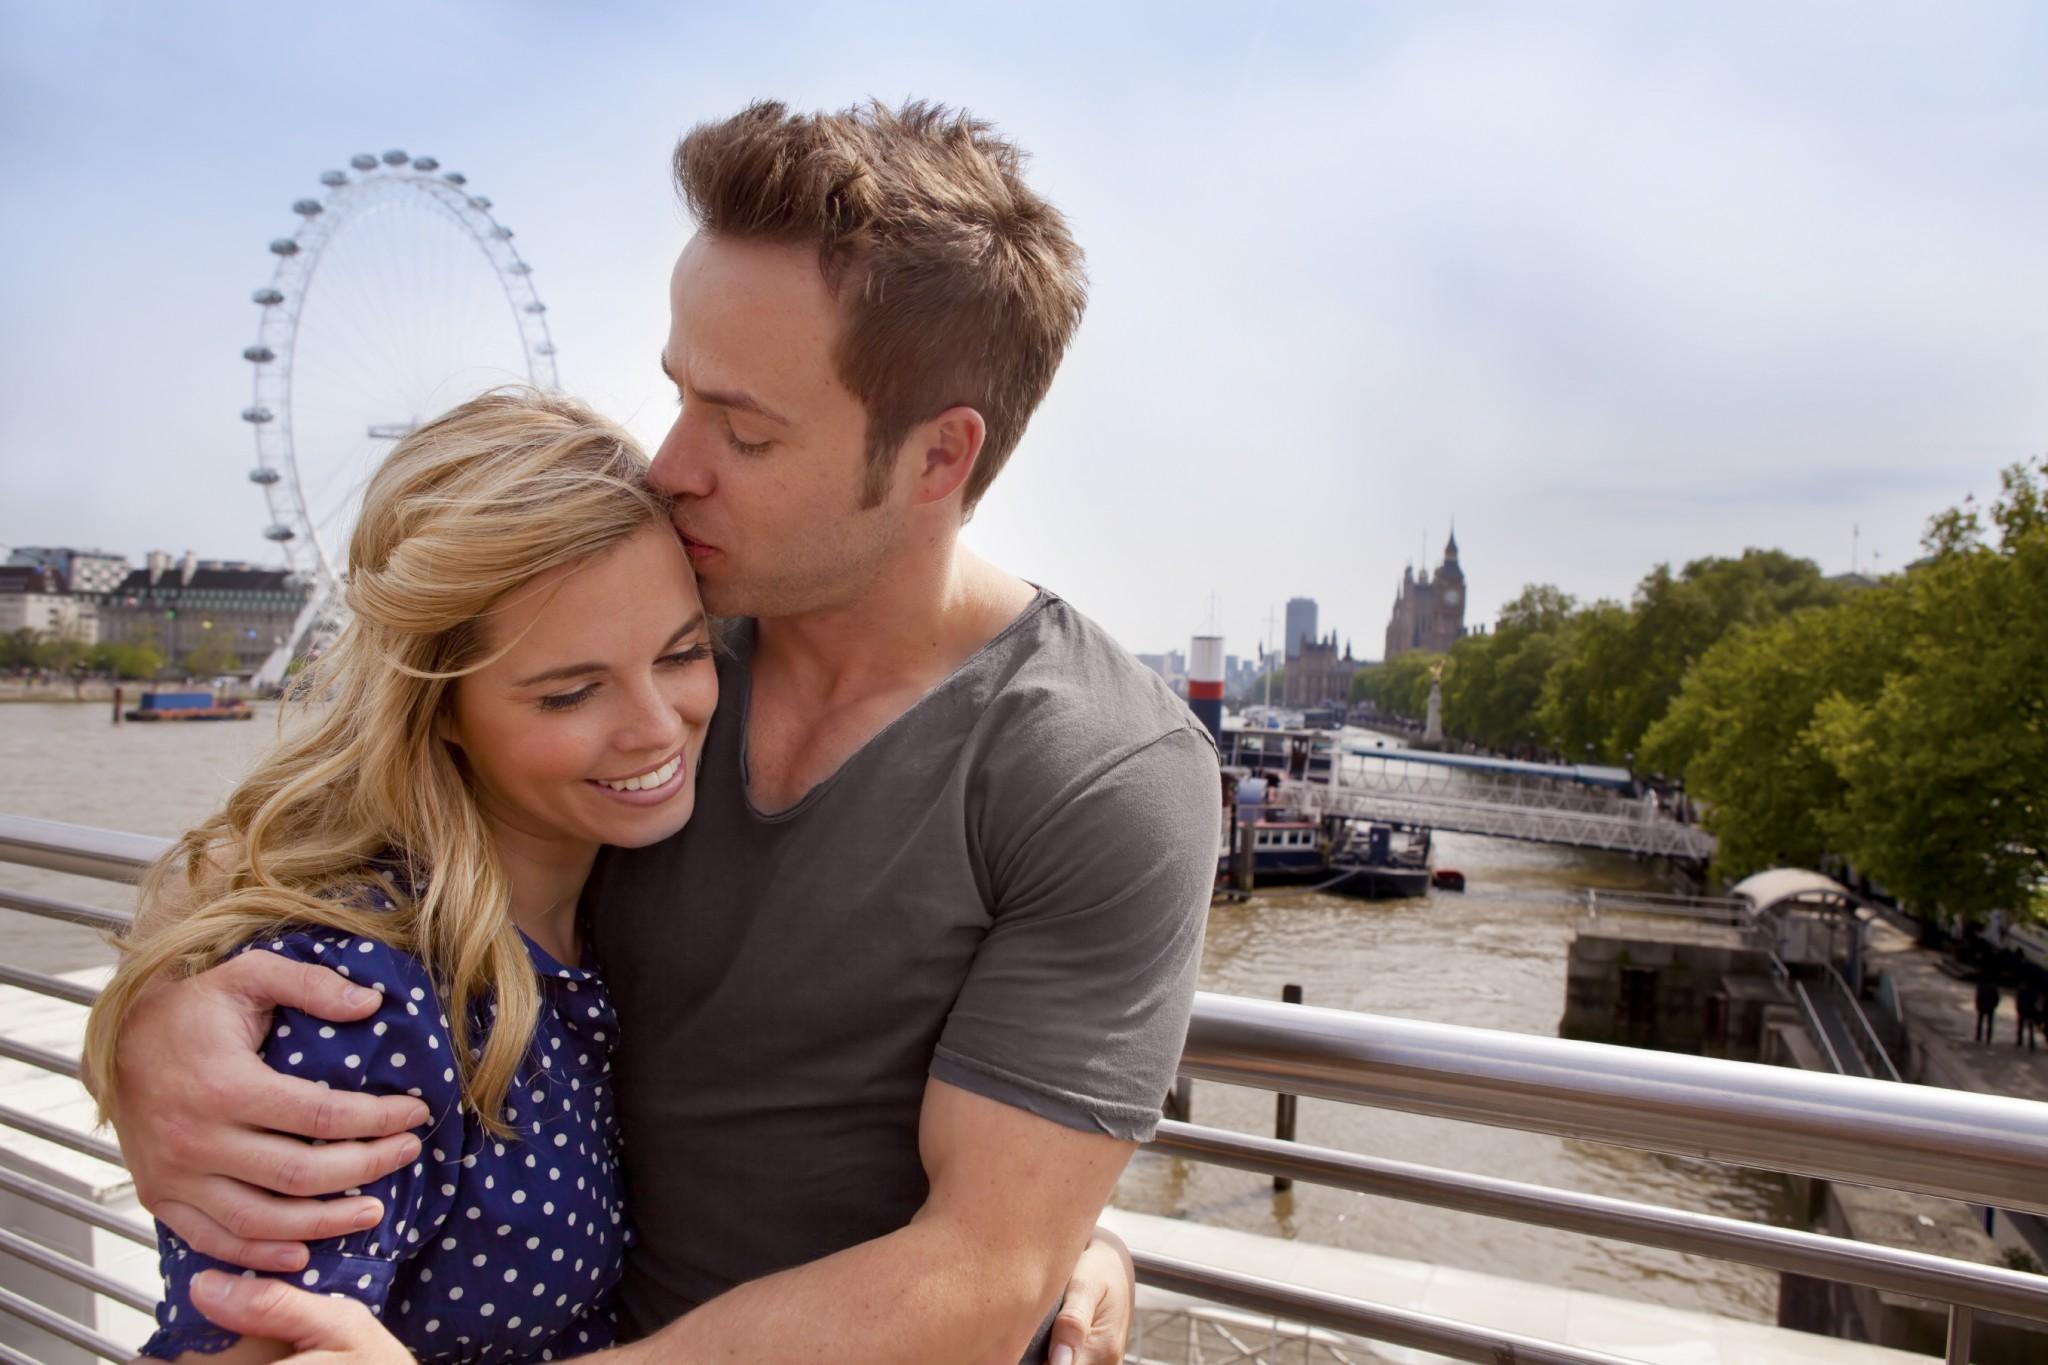 Why everyone should visit London